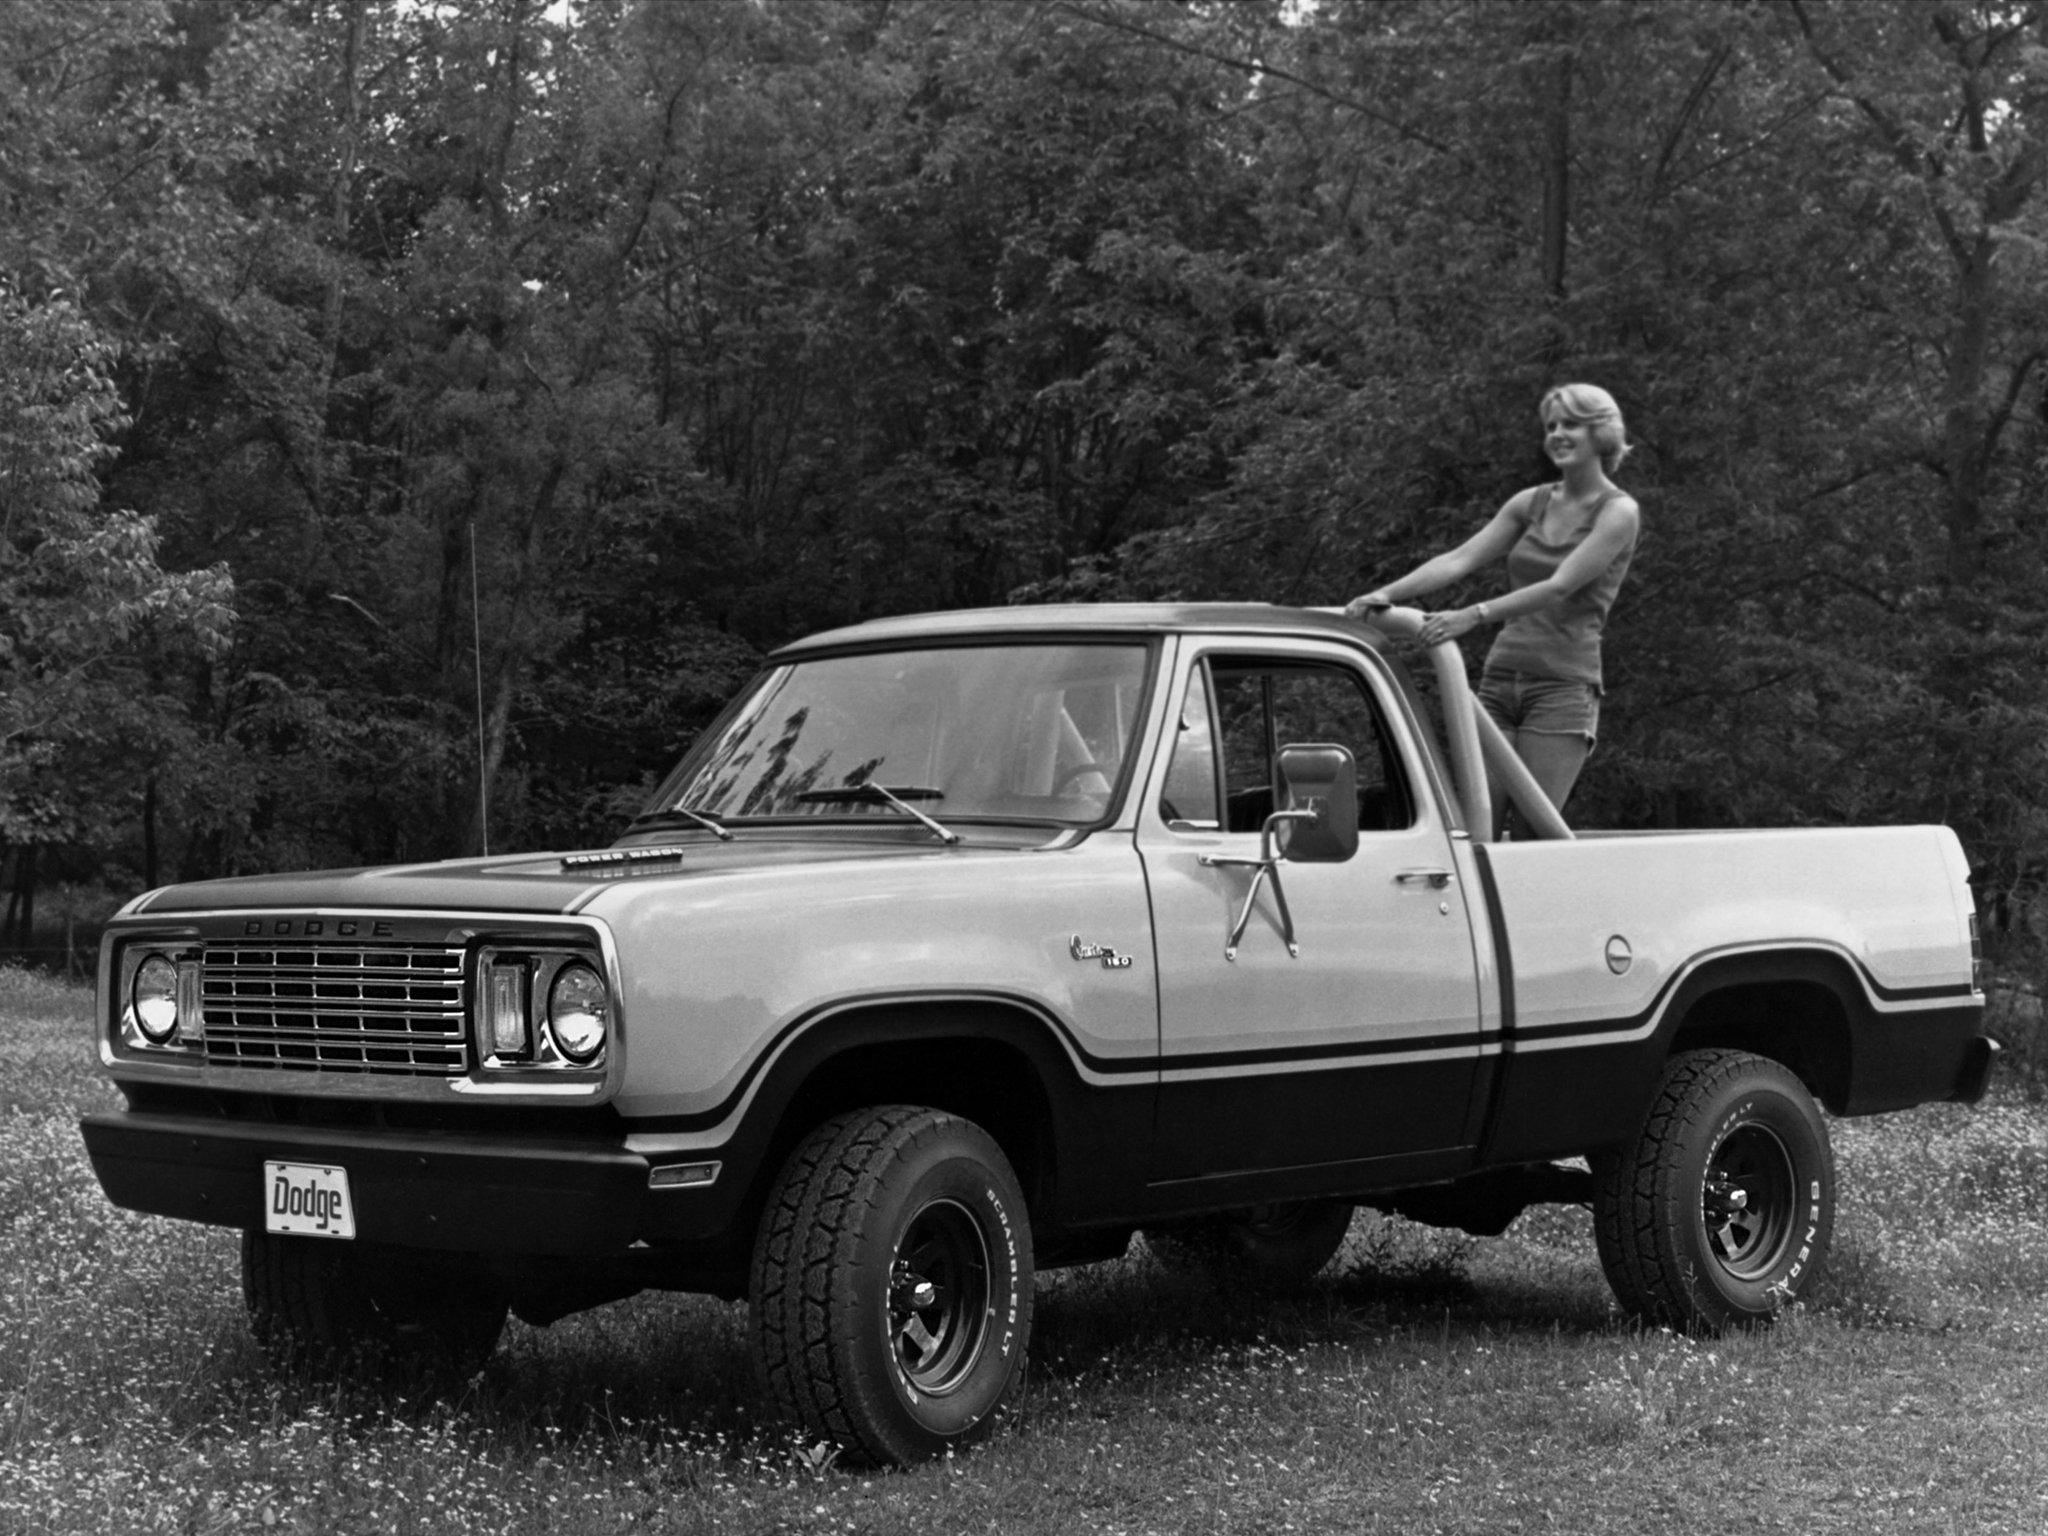 1978 dodge truck 4x4